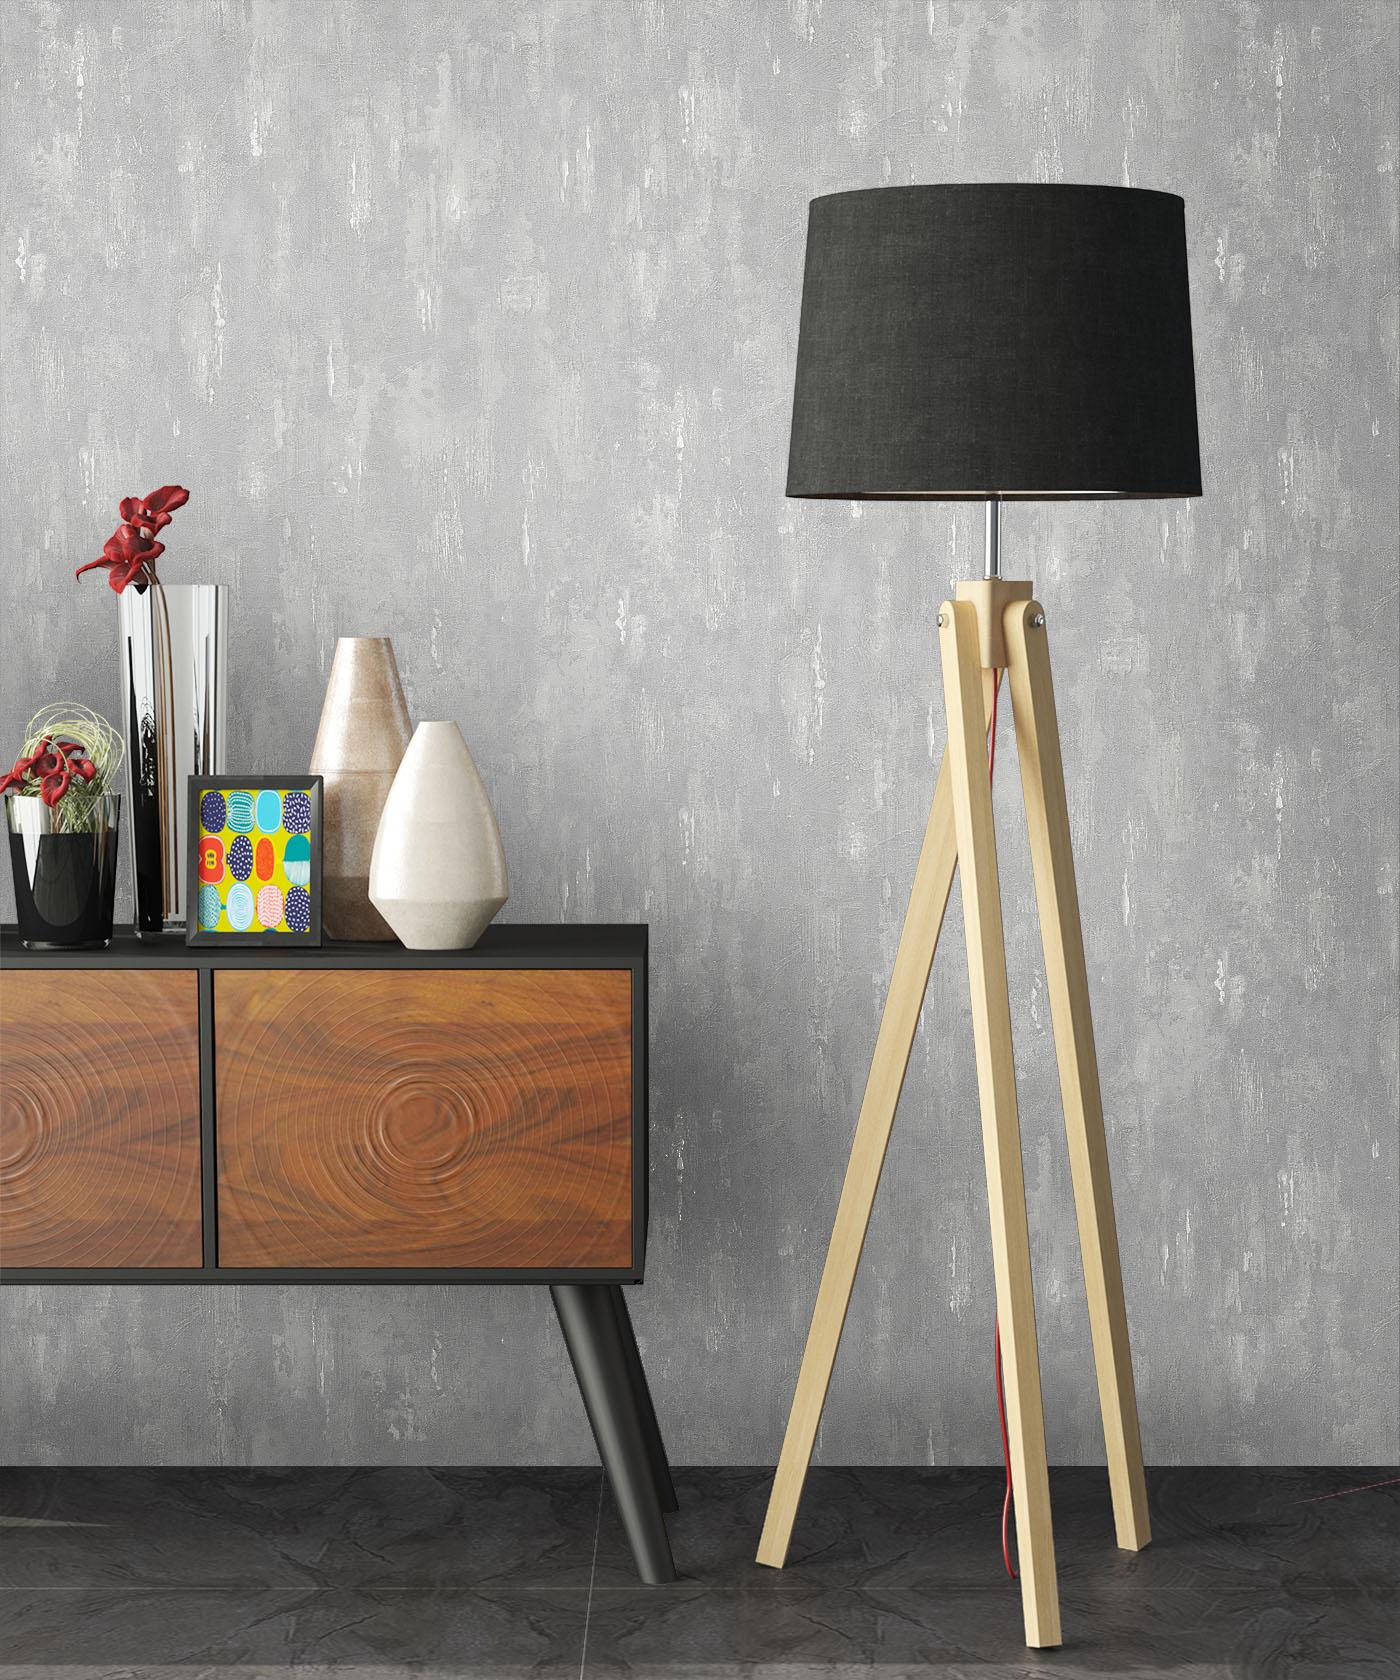 tapete vlies stein beton grau steinwand putz metall optik vliestapete neu ebay. Black Bedroom Furniture Sets. Home Design Ideas